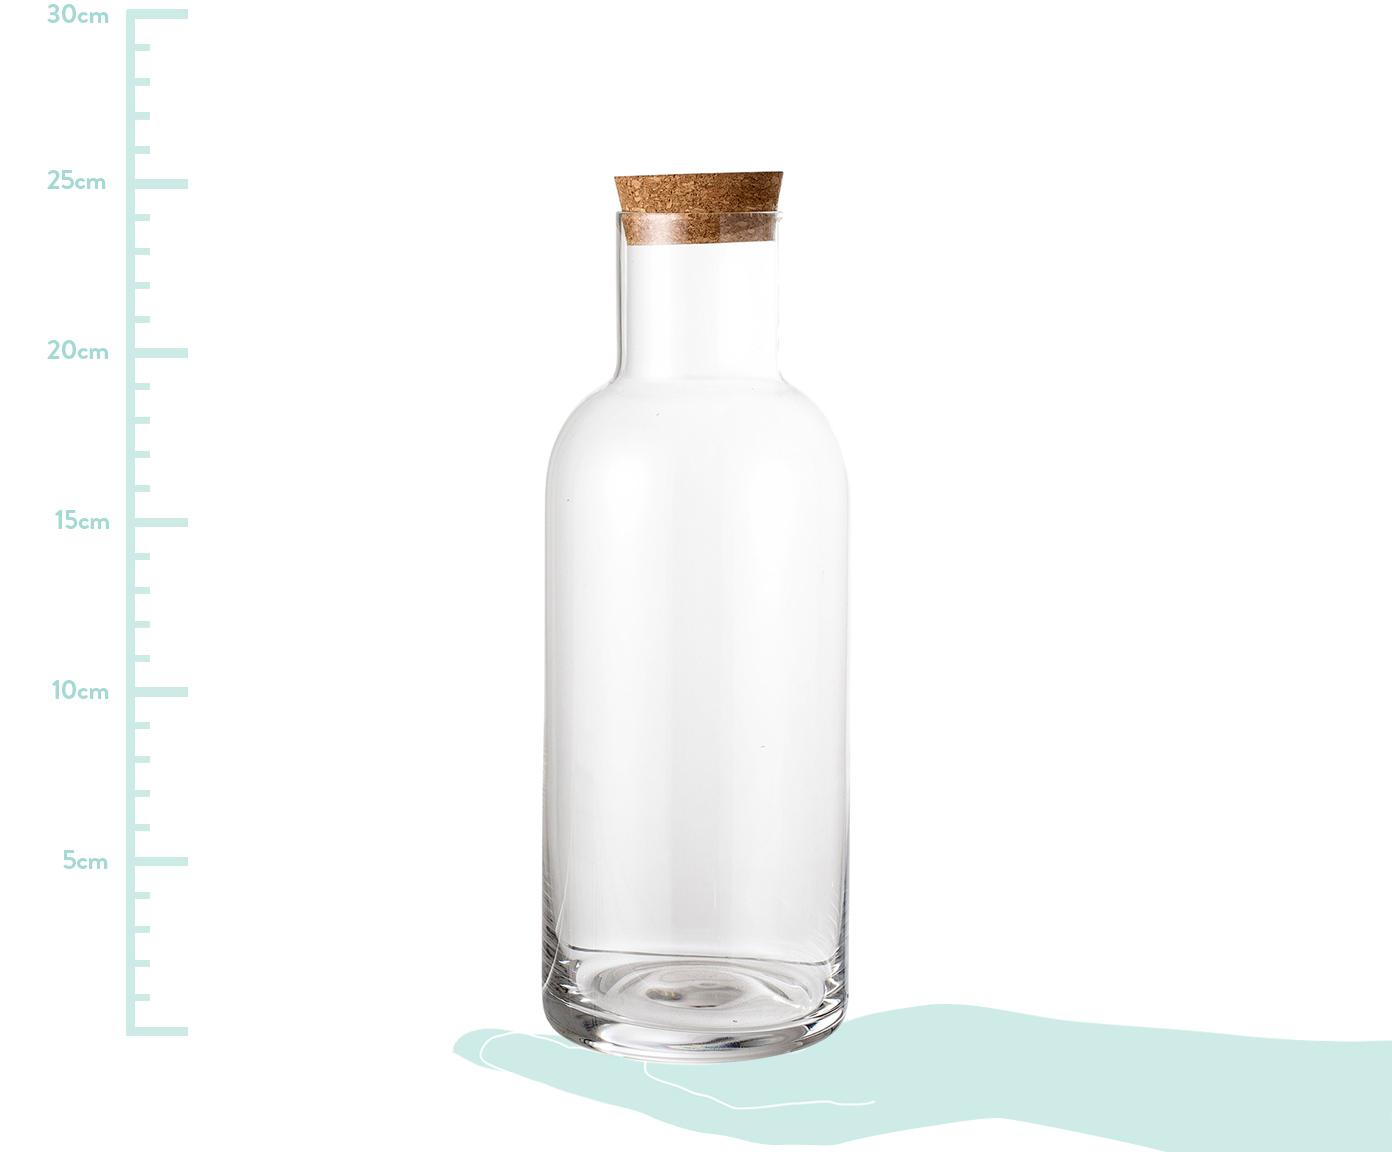 Caraffa trasparente Clearance, Coperchio: sughero, Trasparente, 1 l